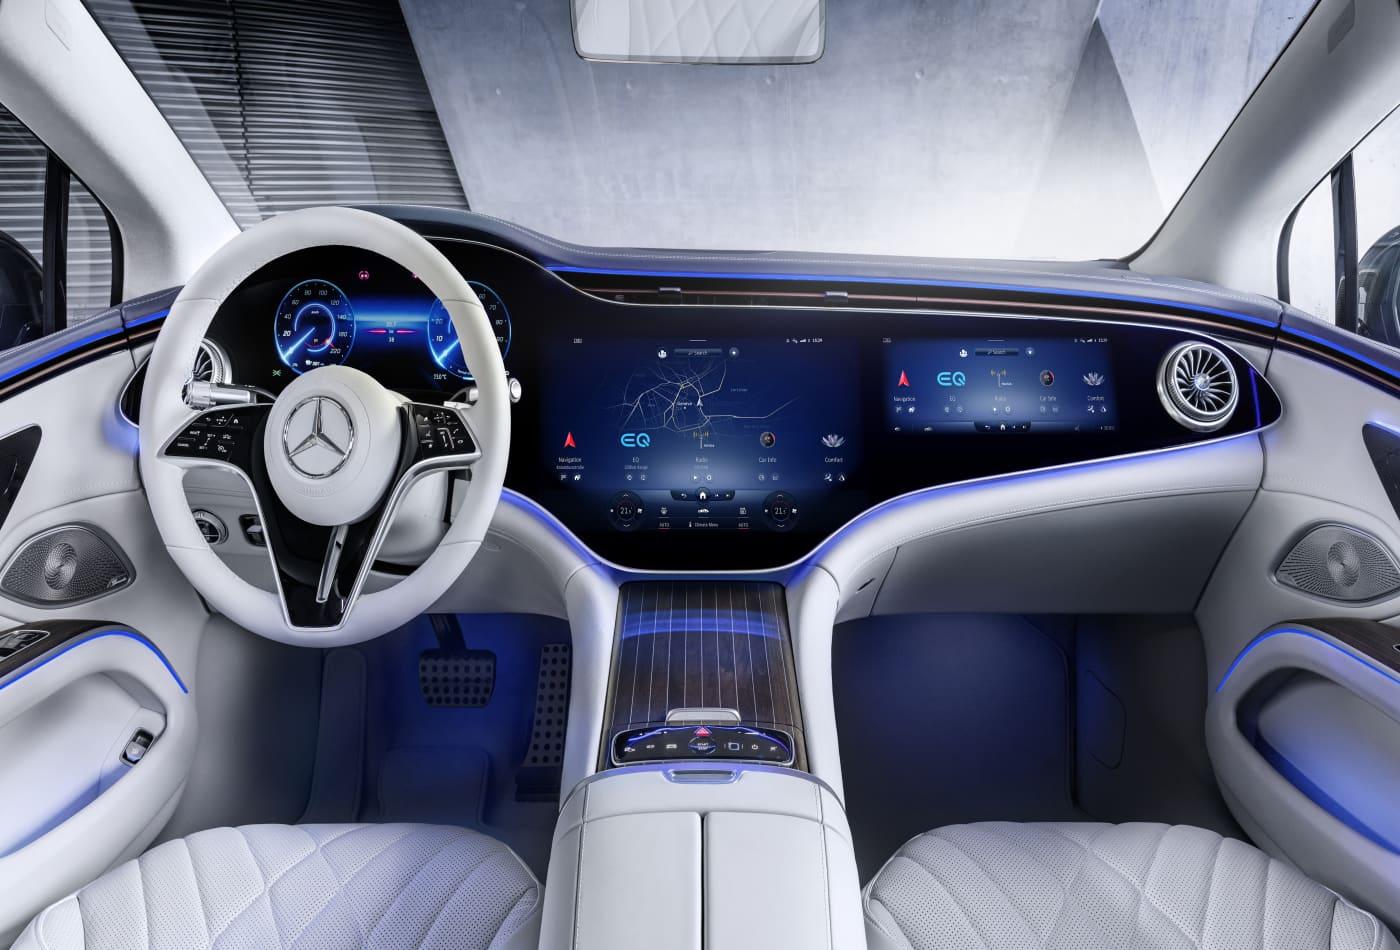 Mercedes-Benz unveils new flagship EQS electric sedan to take on Tesla